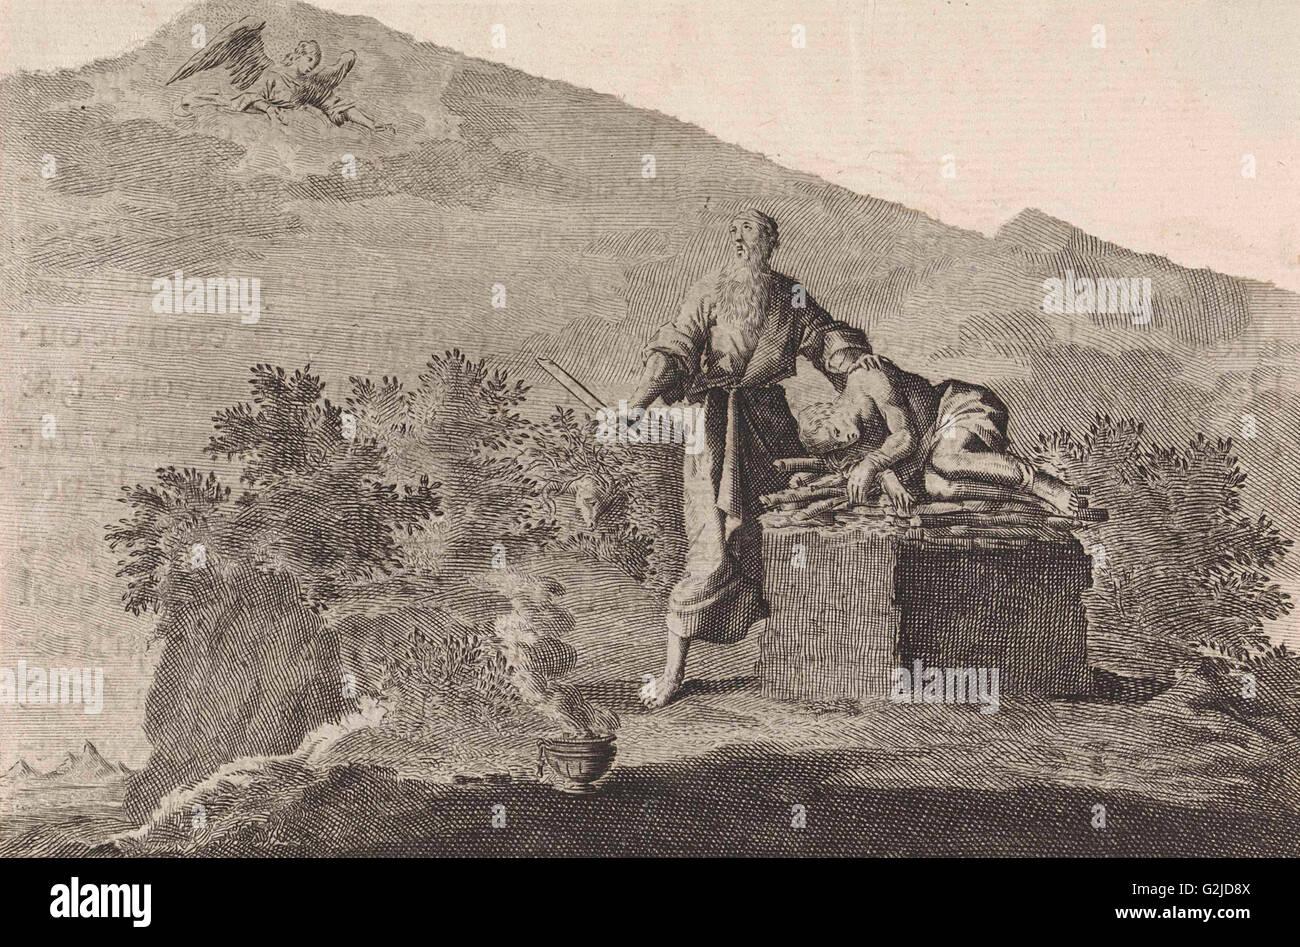 Sacrifice of Isaac, Jan Luyken, Pieter Mortier, 1703 - 1762 - Stock Image